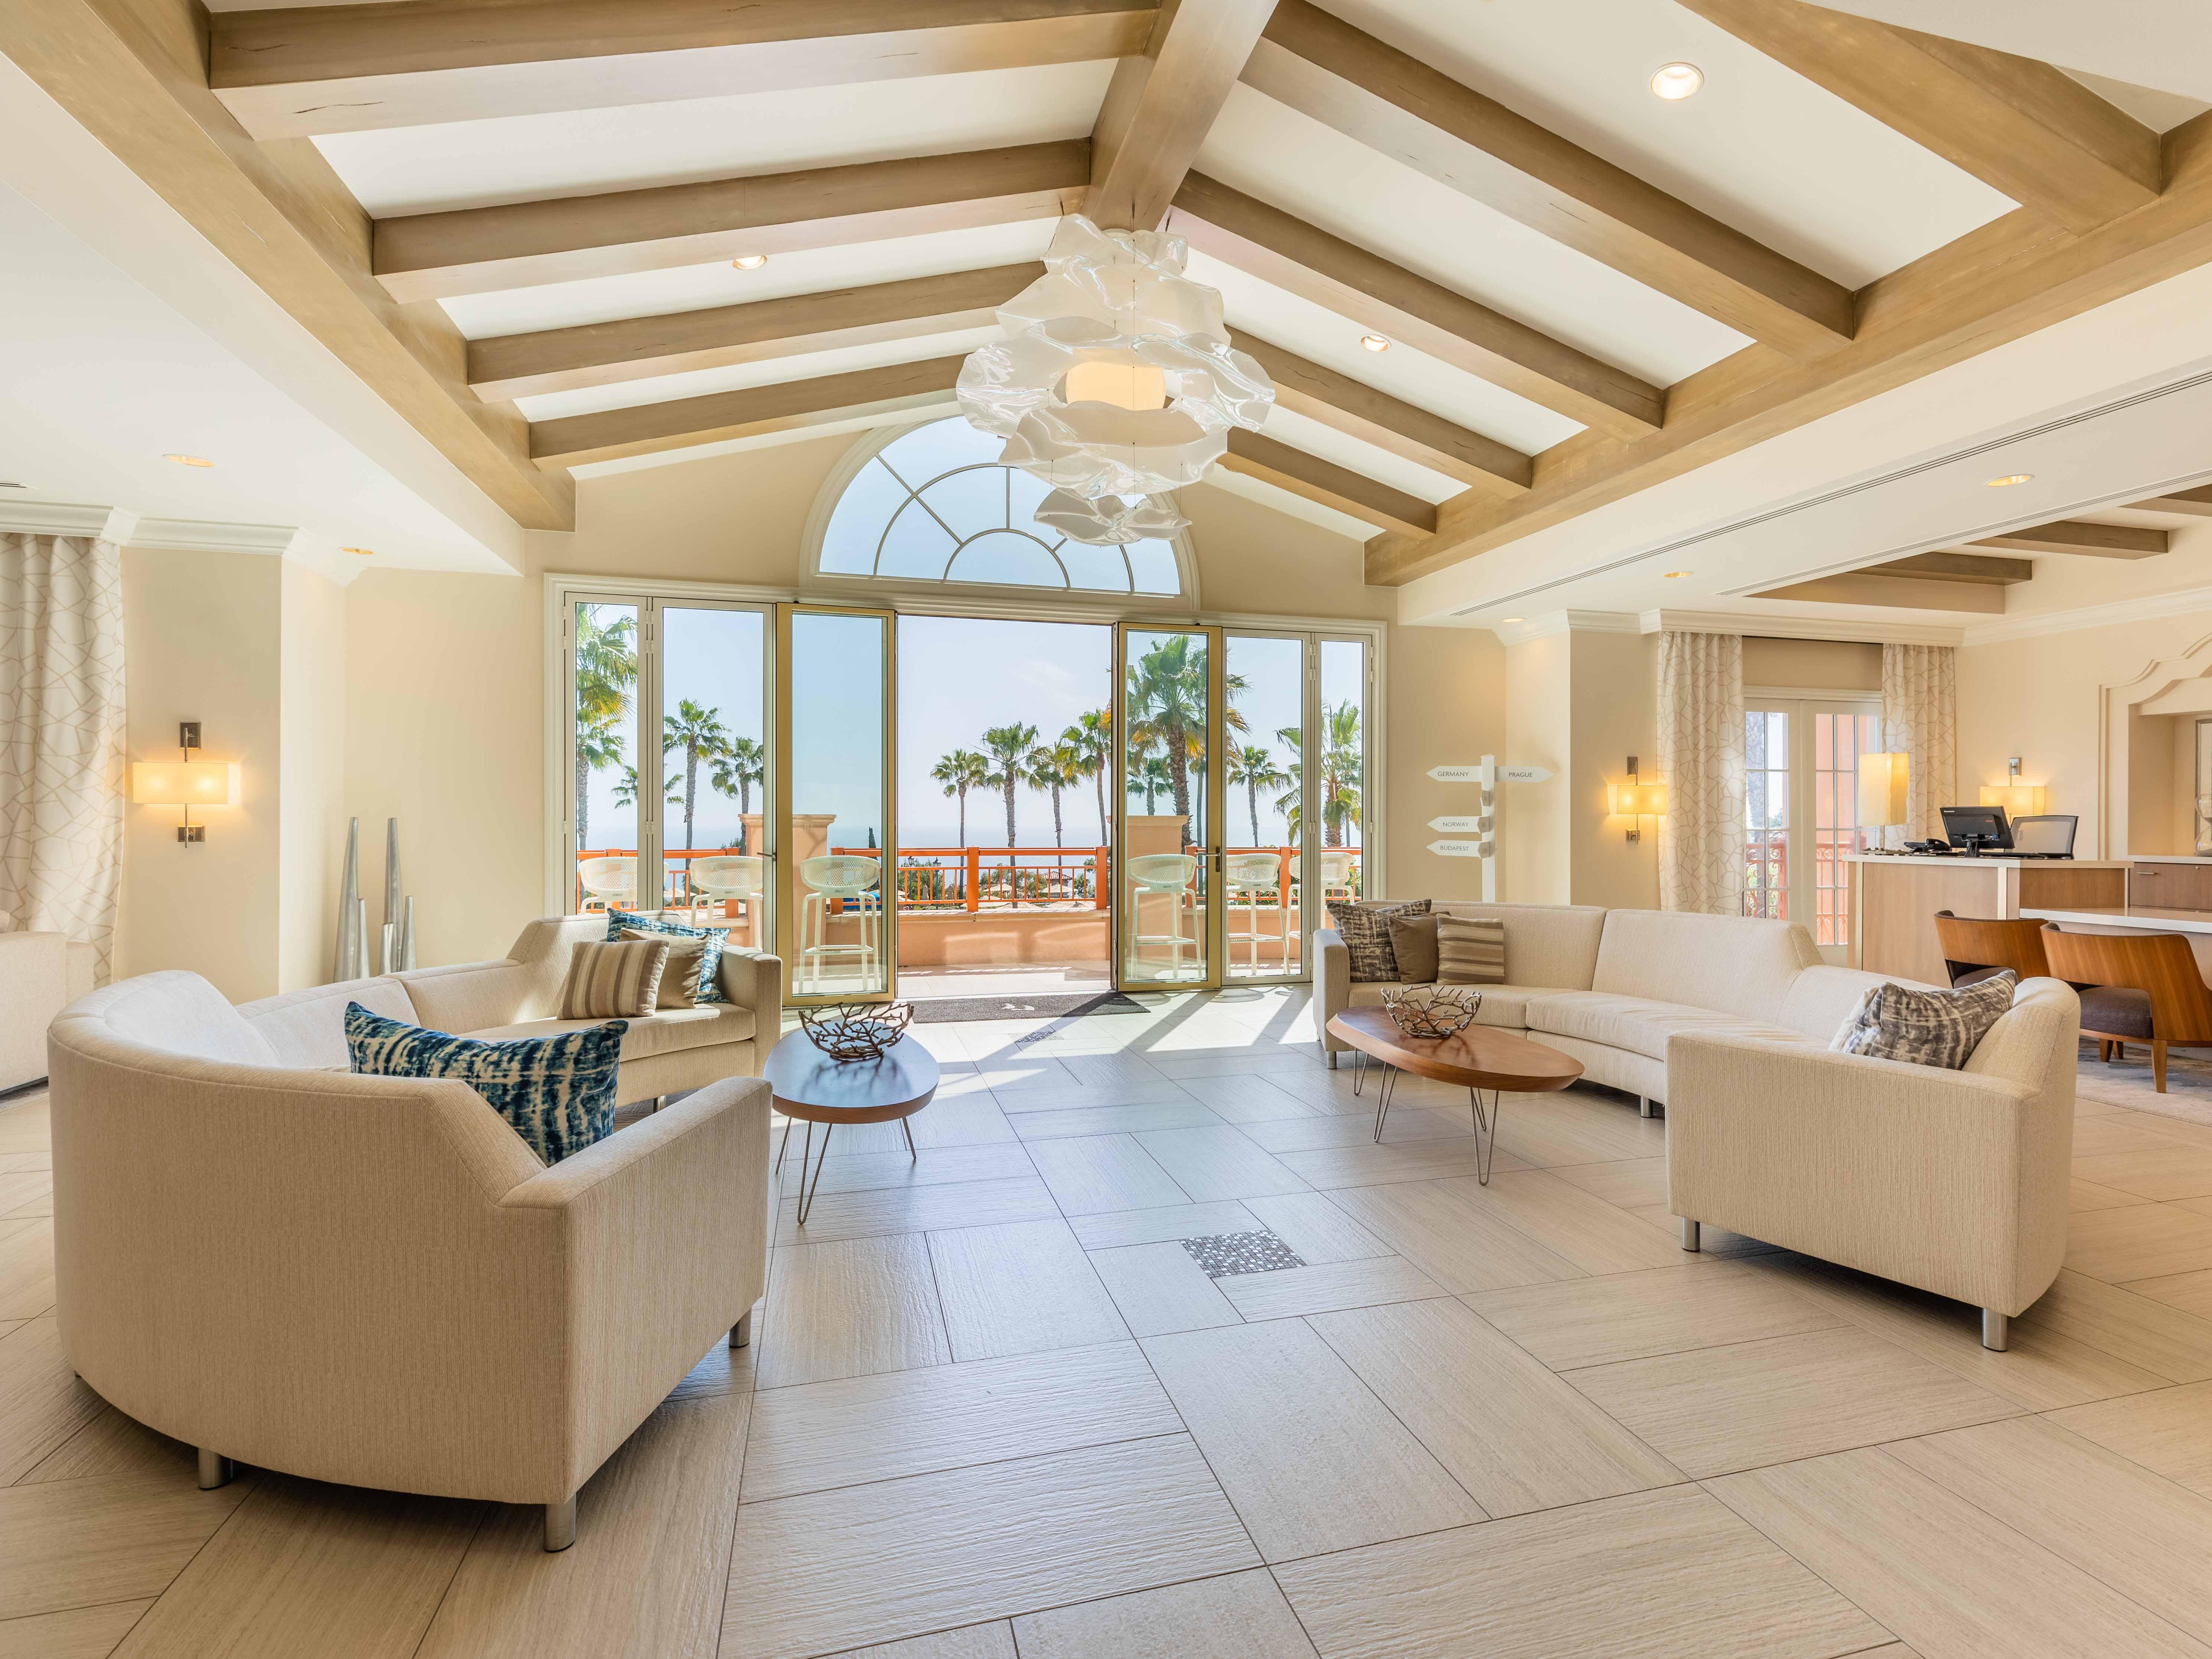 Marriott's Newport Coast<span class='trademark'>®</span> Villas Resort Lobby. Marriott's Newport Coast<span class='trademark'>®</span> Villas is located in Newport Coast, California United States.